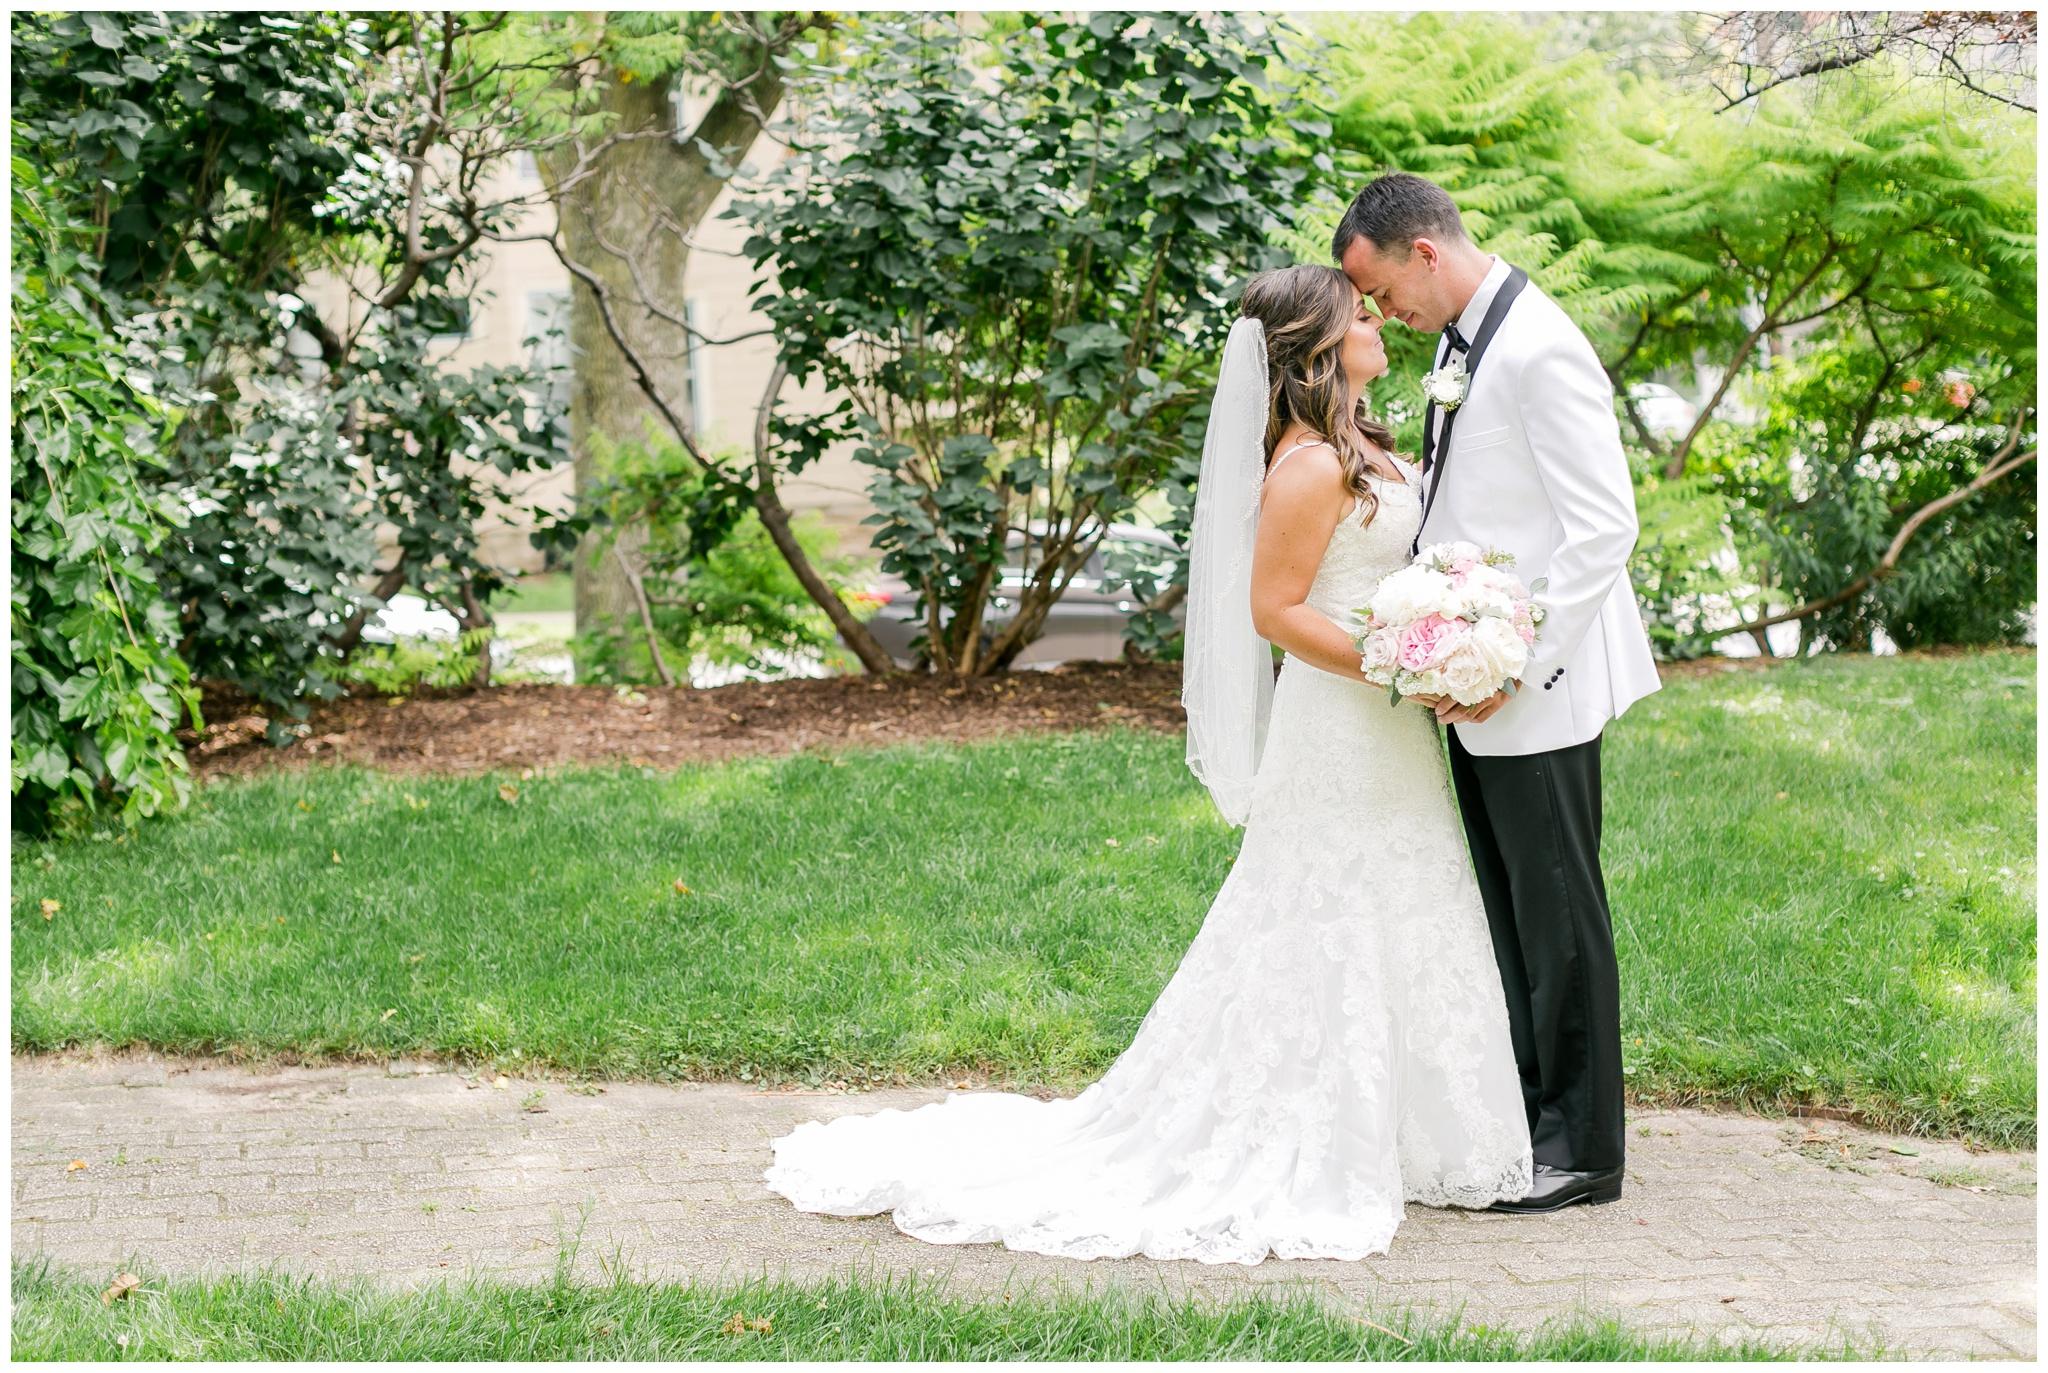 UW_Memorial_Union_wedding_madison_wisconsin_wedding_photographers_4598.jpg